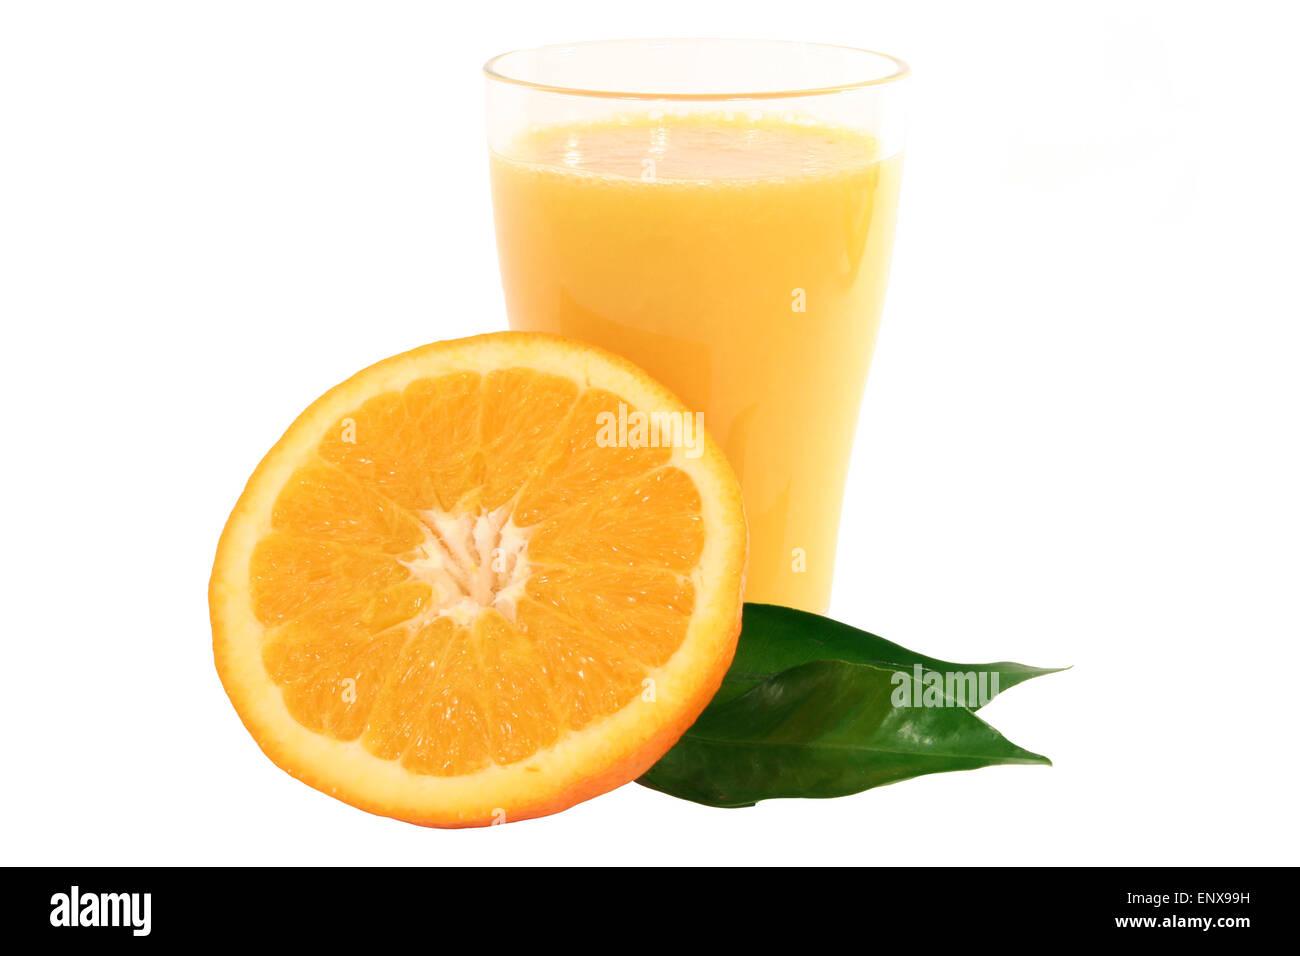 Orangensaft und Orange - Stock Image